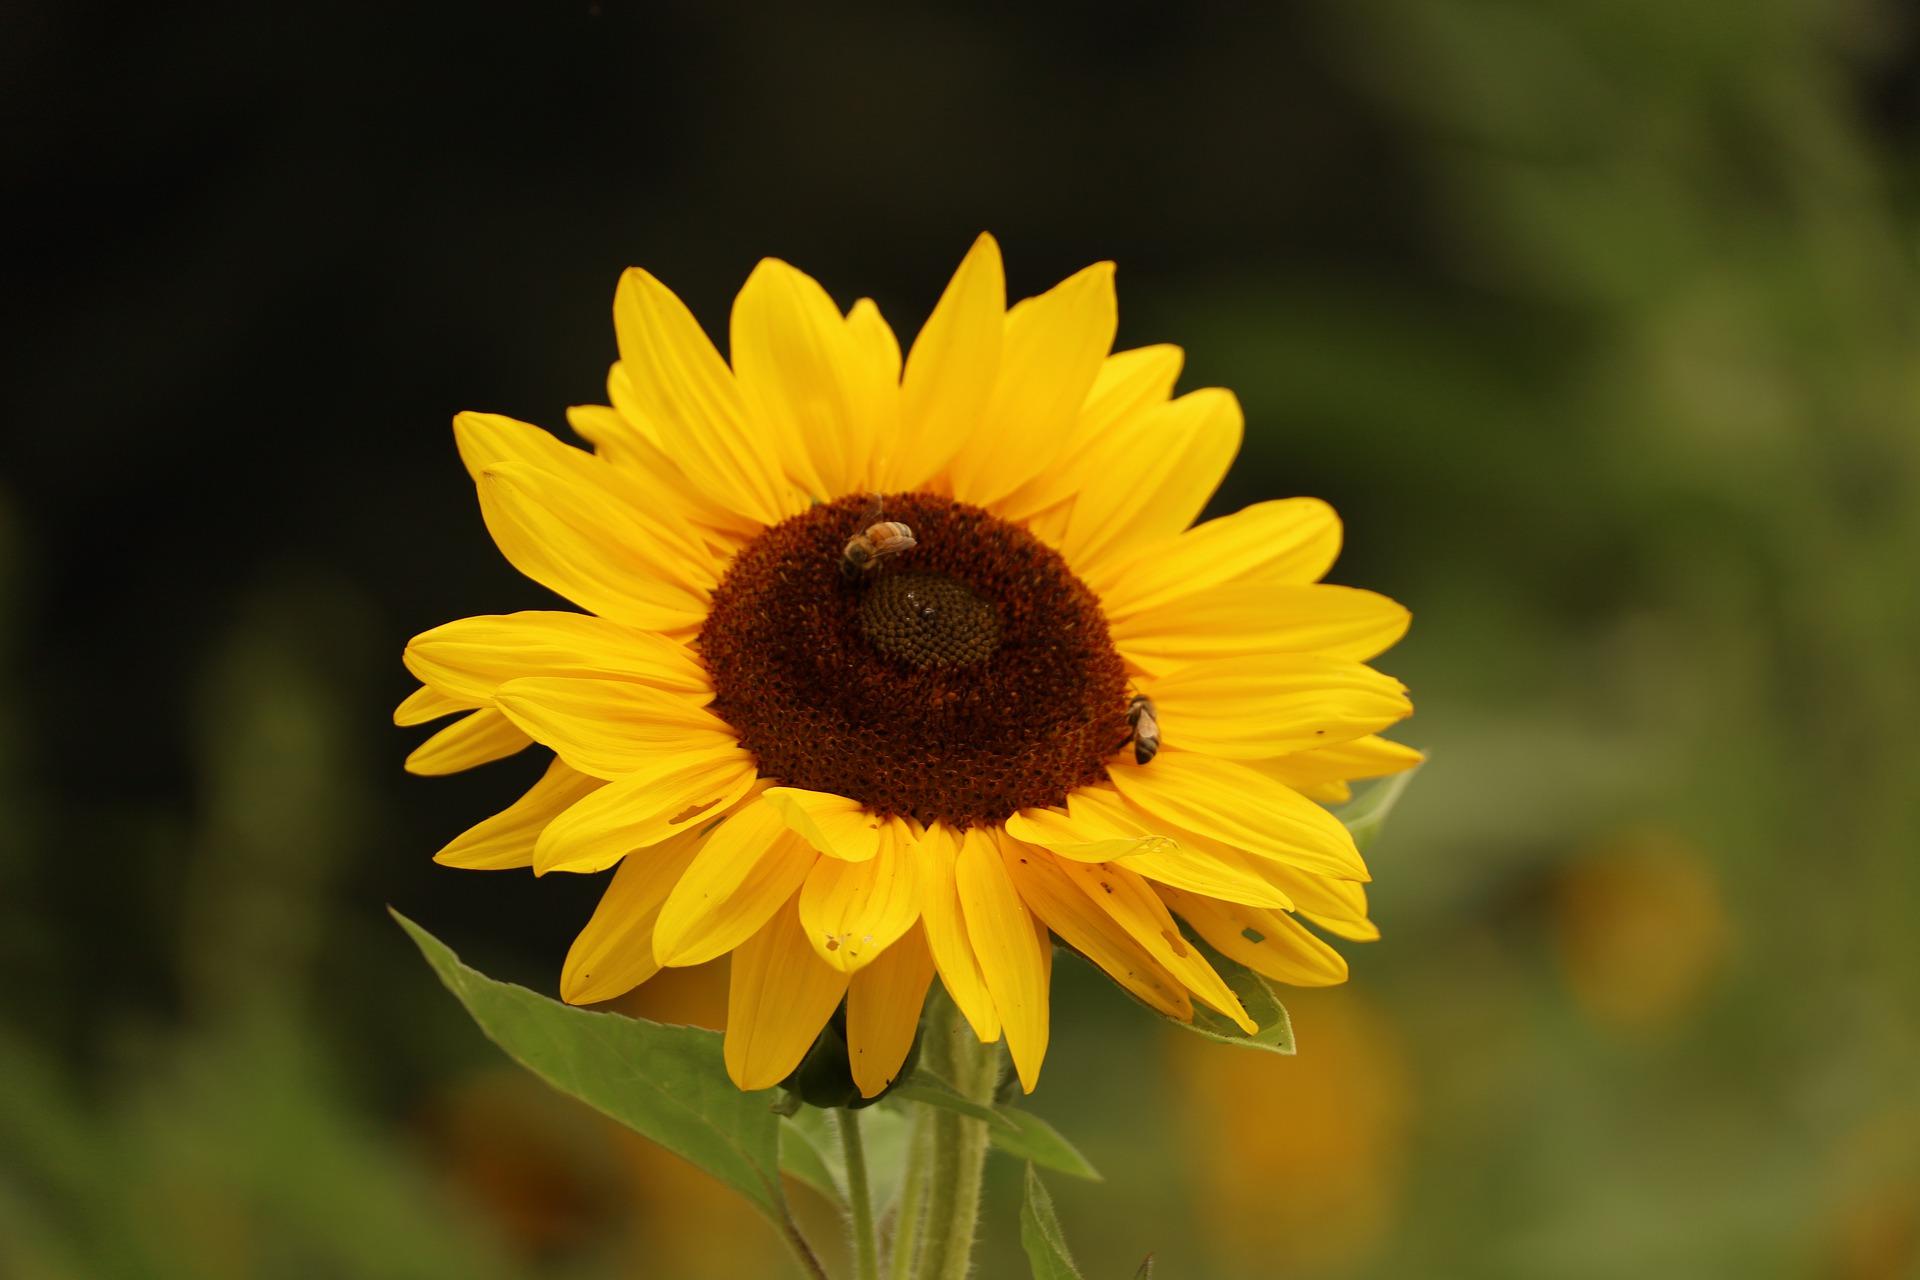 Pflanze des Monats: Sonnenblume - eine blühende Freude